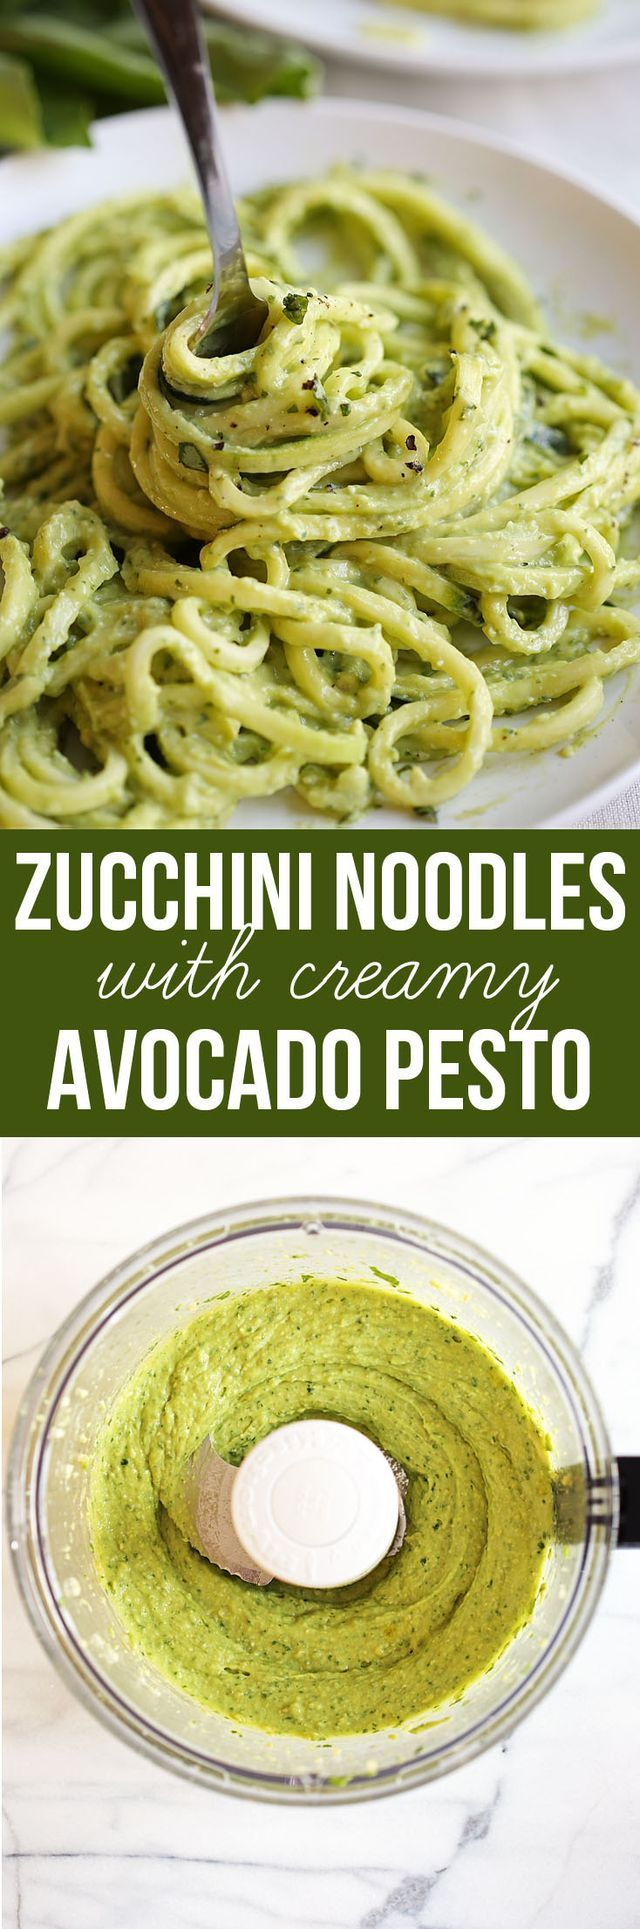 Zucchini Noodles with Creamy Avocado Pesto | Eat Yourself Skinny! | Bloglovin'